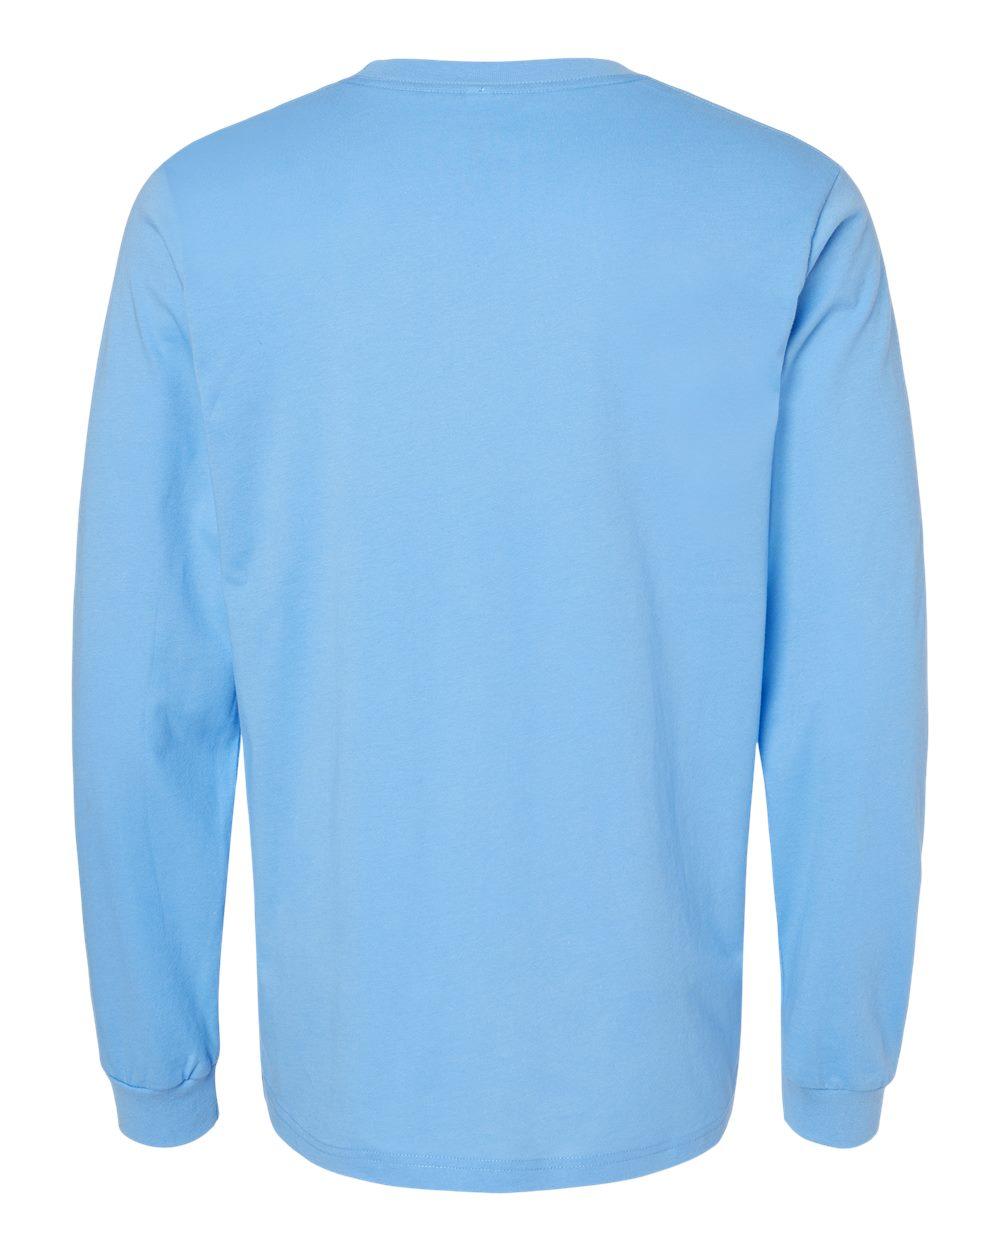 Bella-Canvas-Mens-Blank-Top-Long-Sleeve-Jersey-Tee-T-Shirt-3501-up-to-3XL thumbnail 34